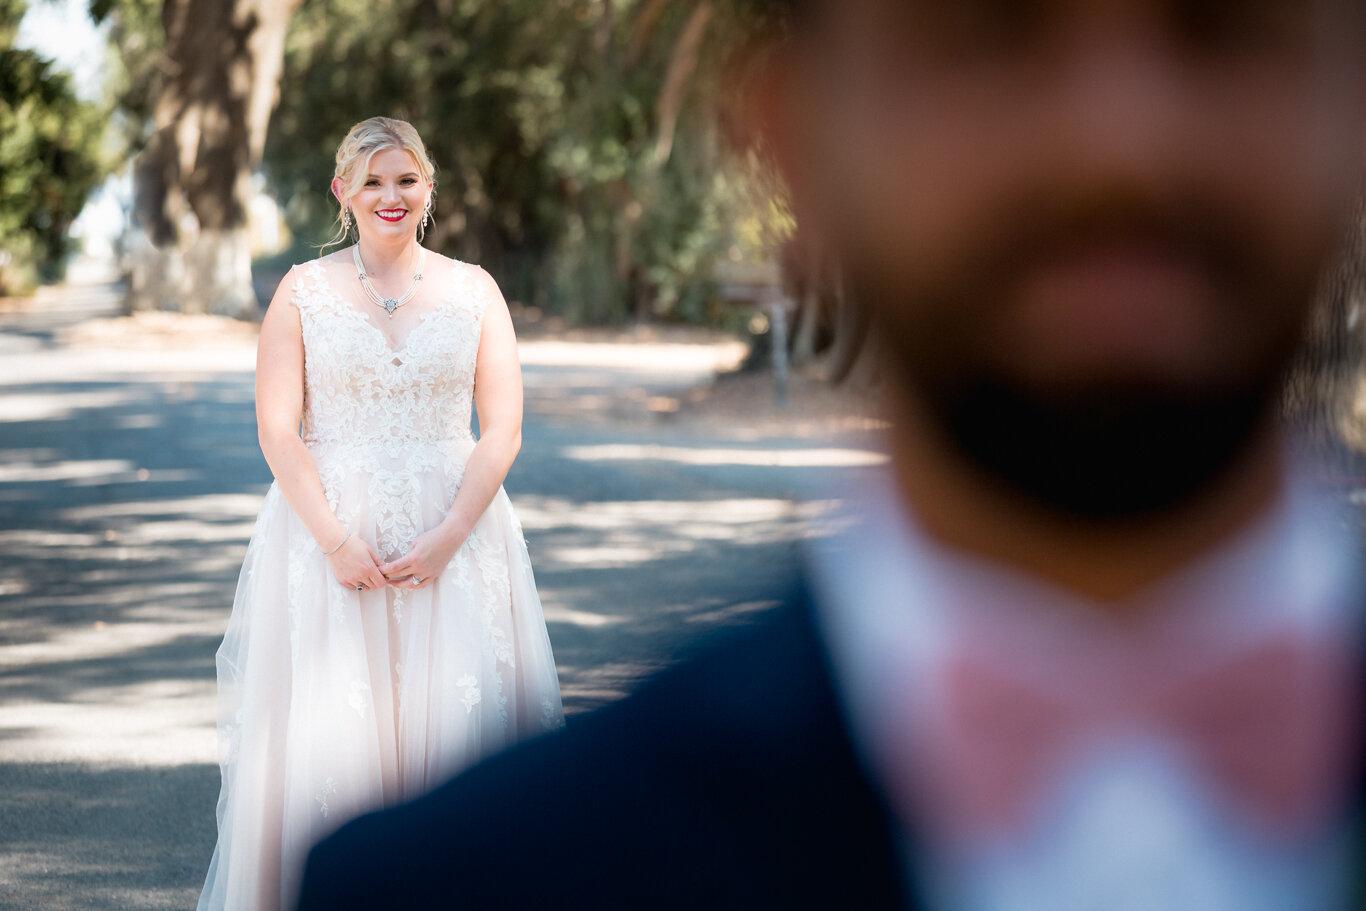 2019.08.24_Emily-Ashir-Wedding-at-the-Maples-5242.jpg